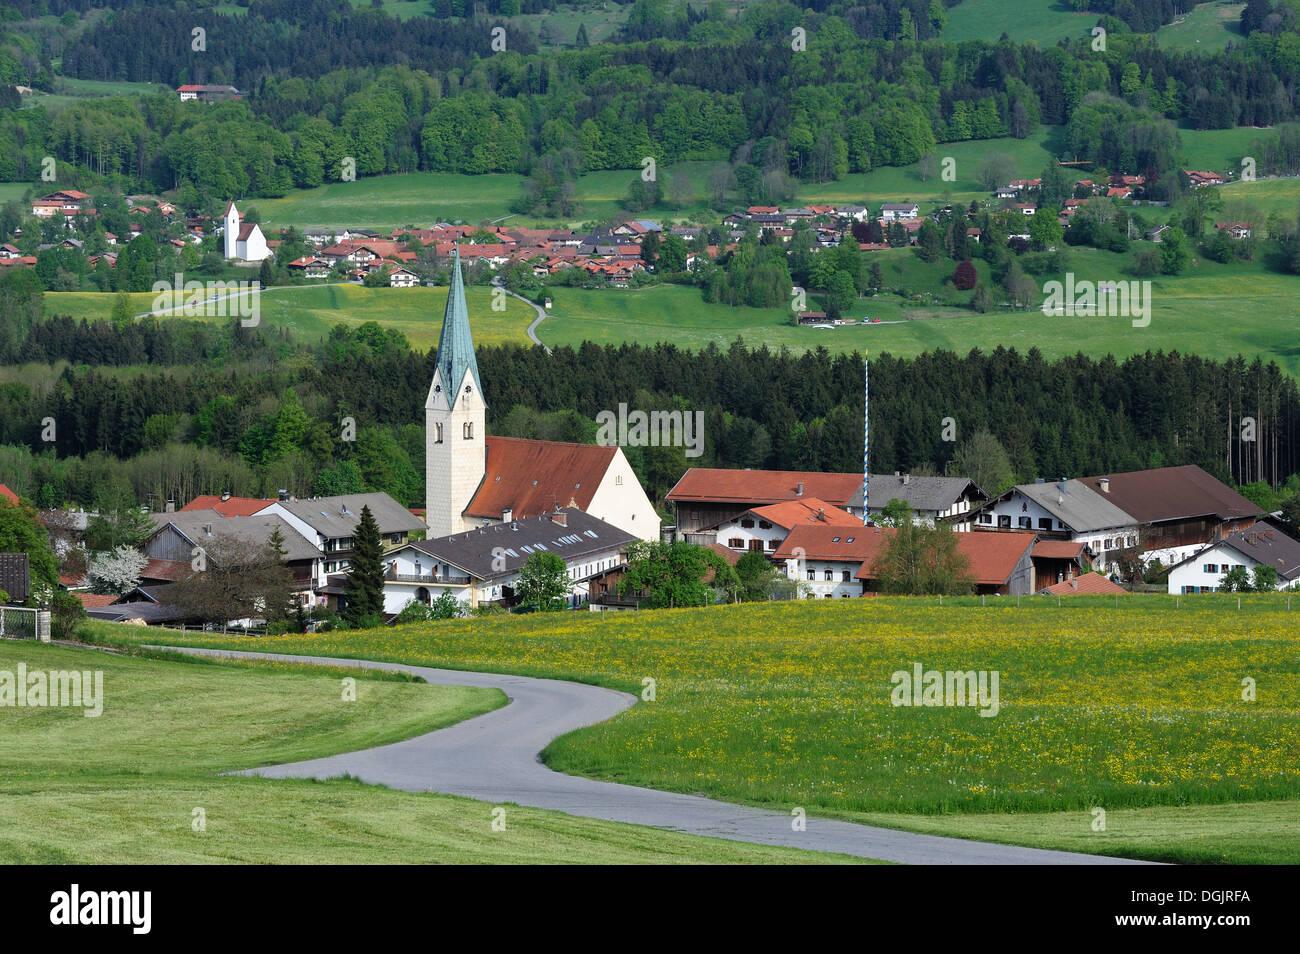 Communities of Toerwang and Grainbach, Samerberg, Chiemgau region, Upper Bavaria, Bavaria, PublicGround - Stock Image